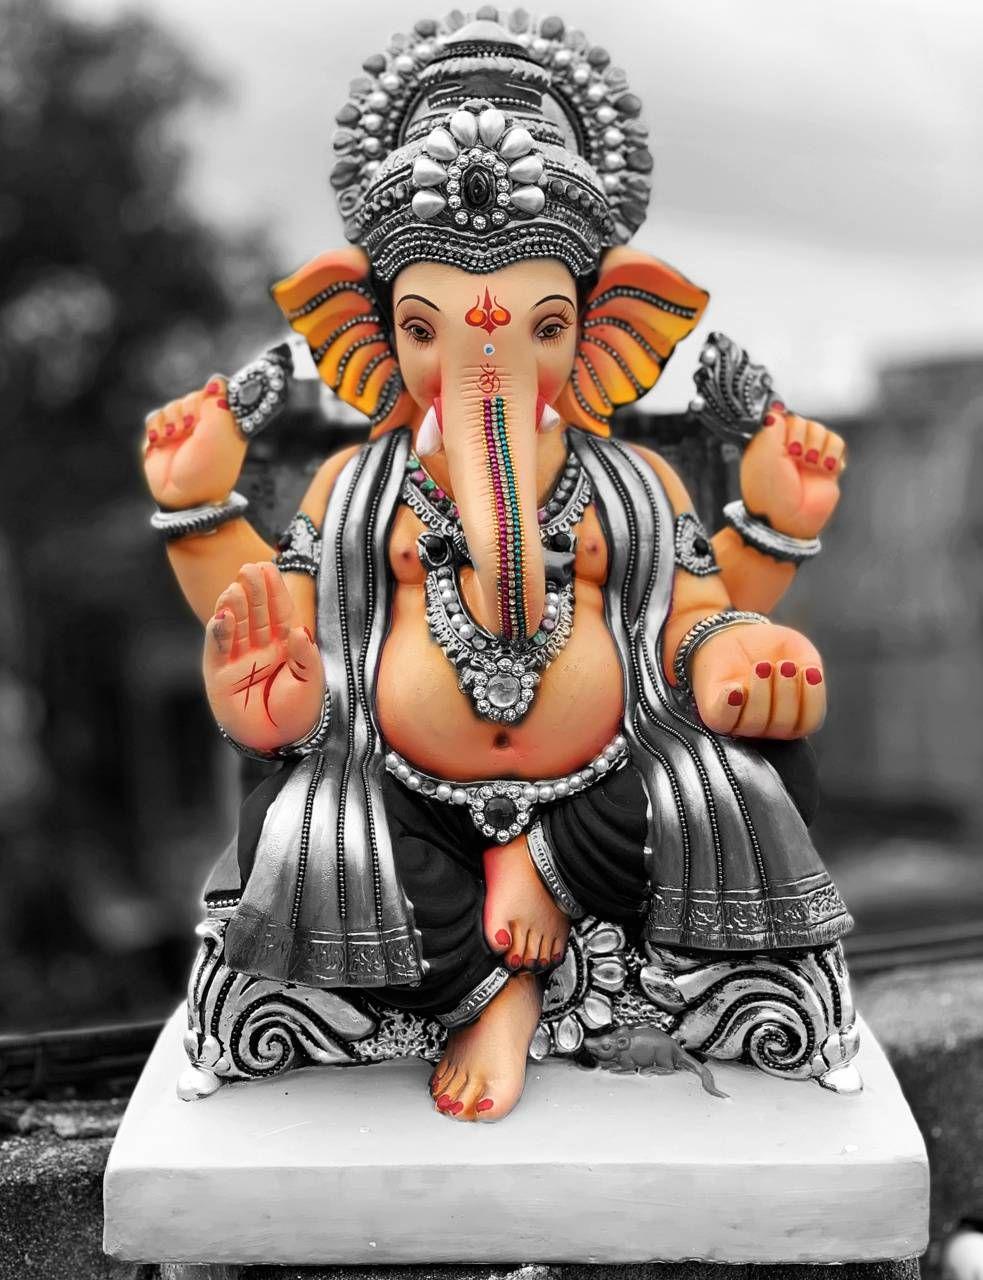 Download Ganesha Wallpaper by sinhalchirag   6e   on ZEDGE 983x1280